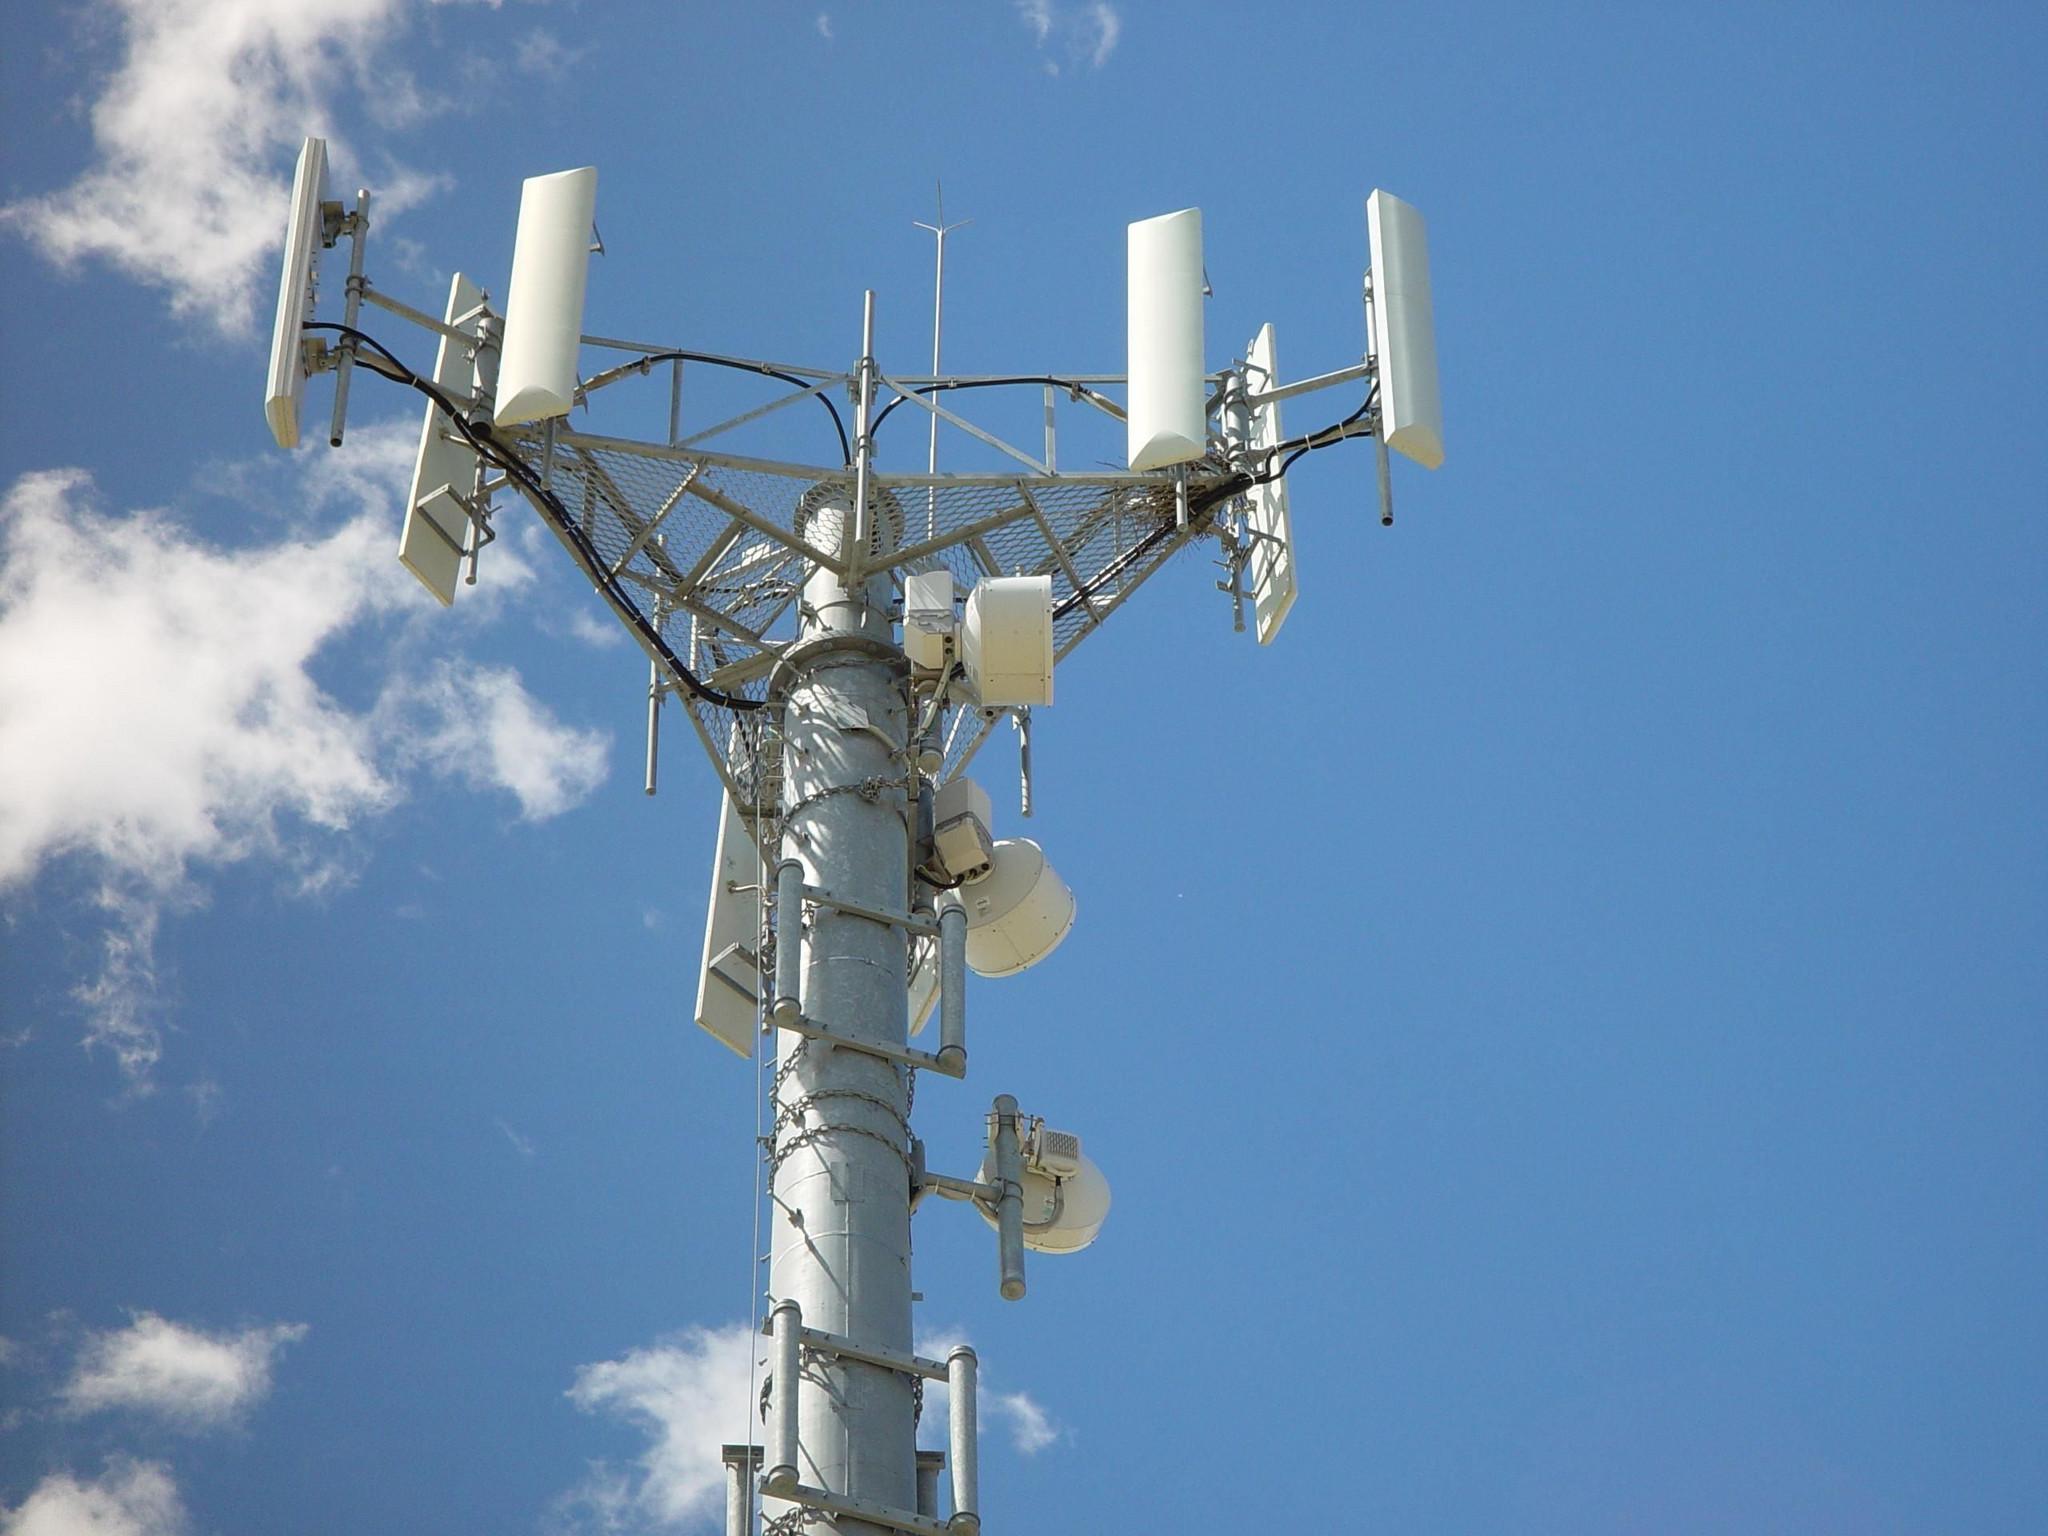 Mobile_telephone_antennas_tower.jpg